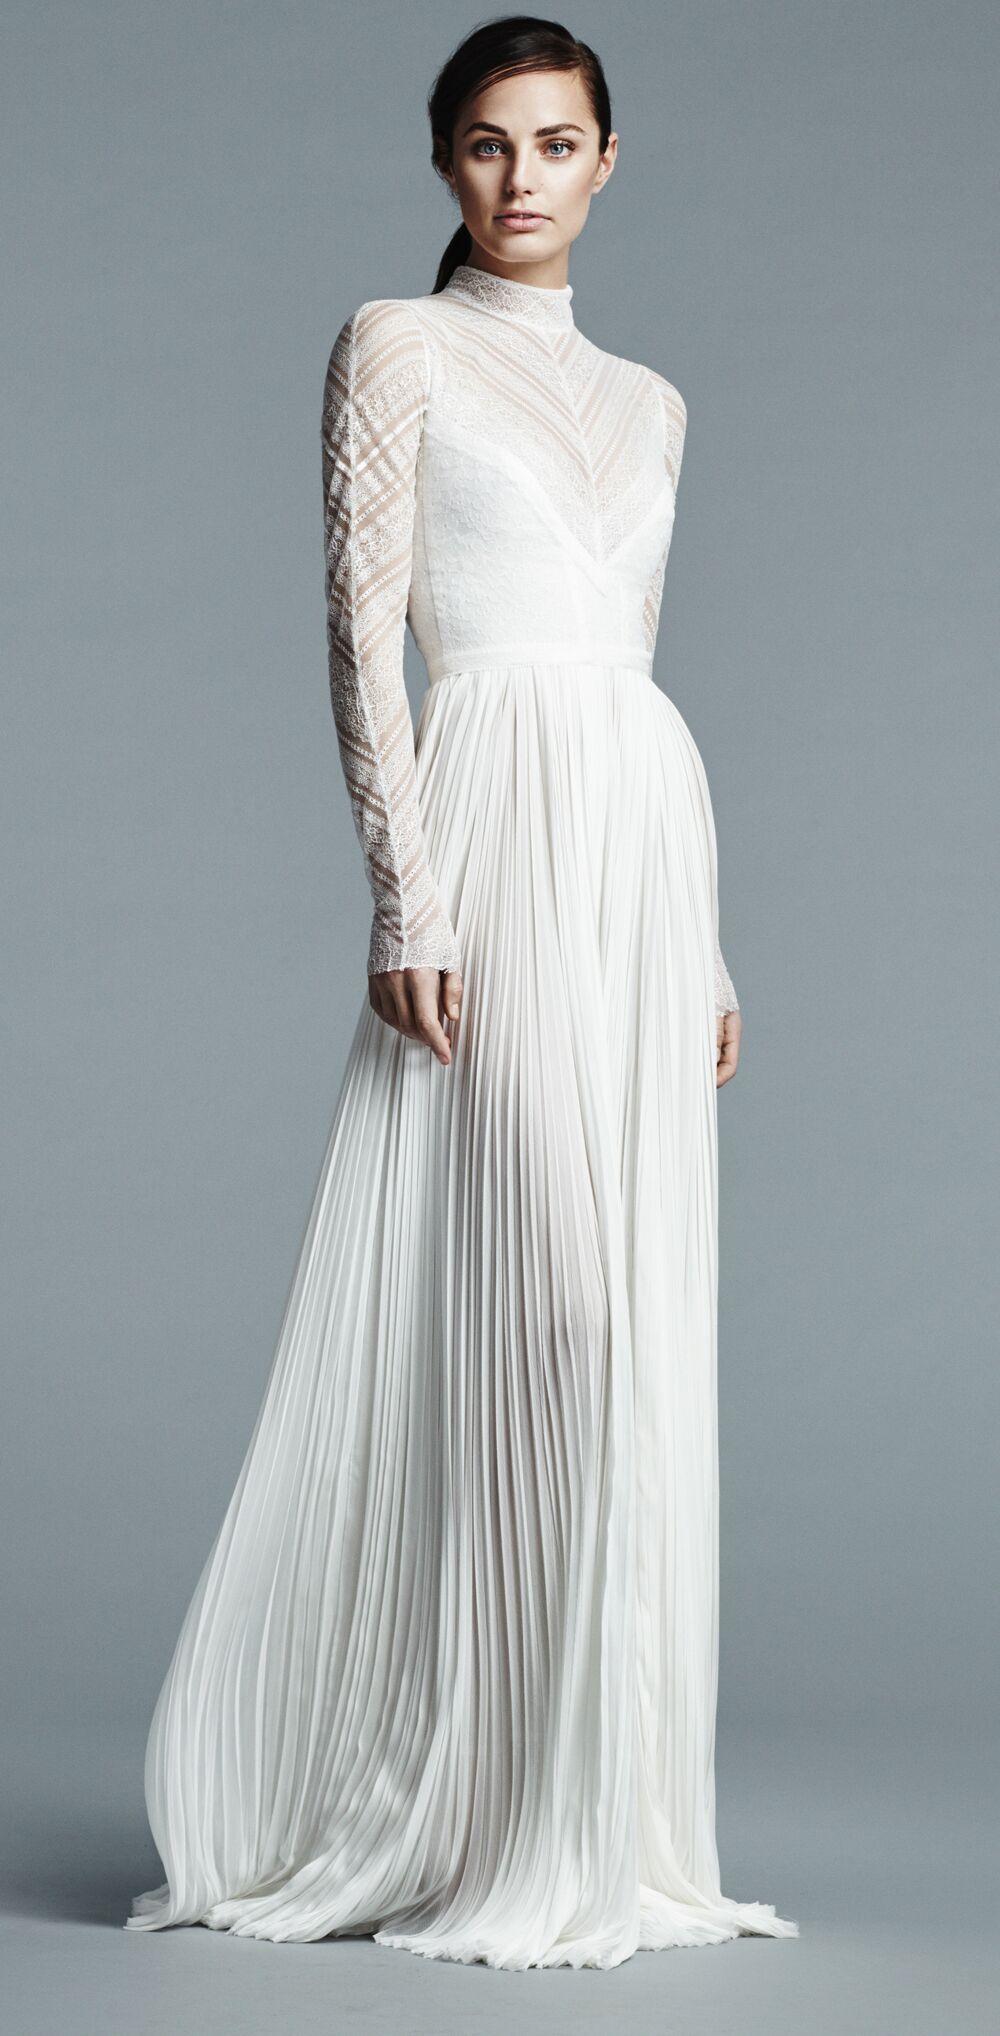 J. Mendel Spring 2017 Collection: Bridal Fashion Week